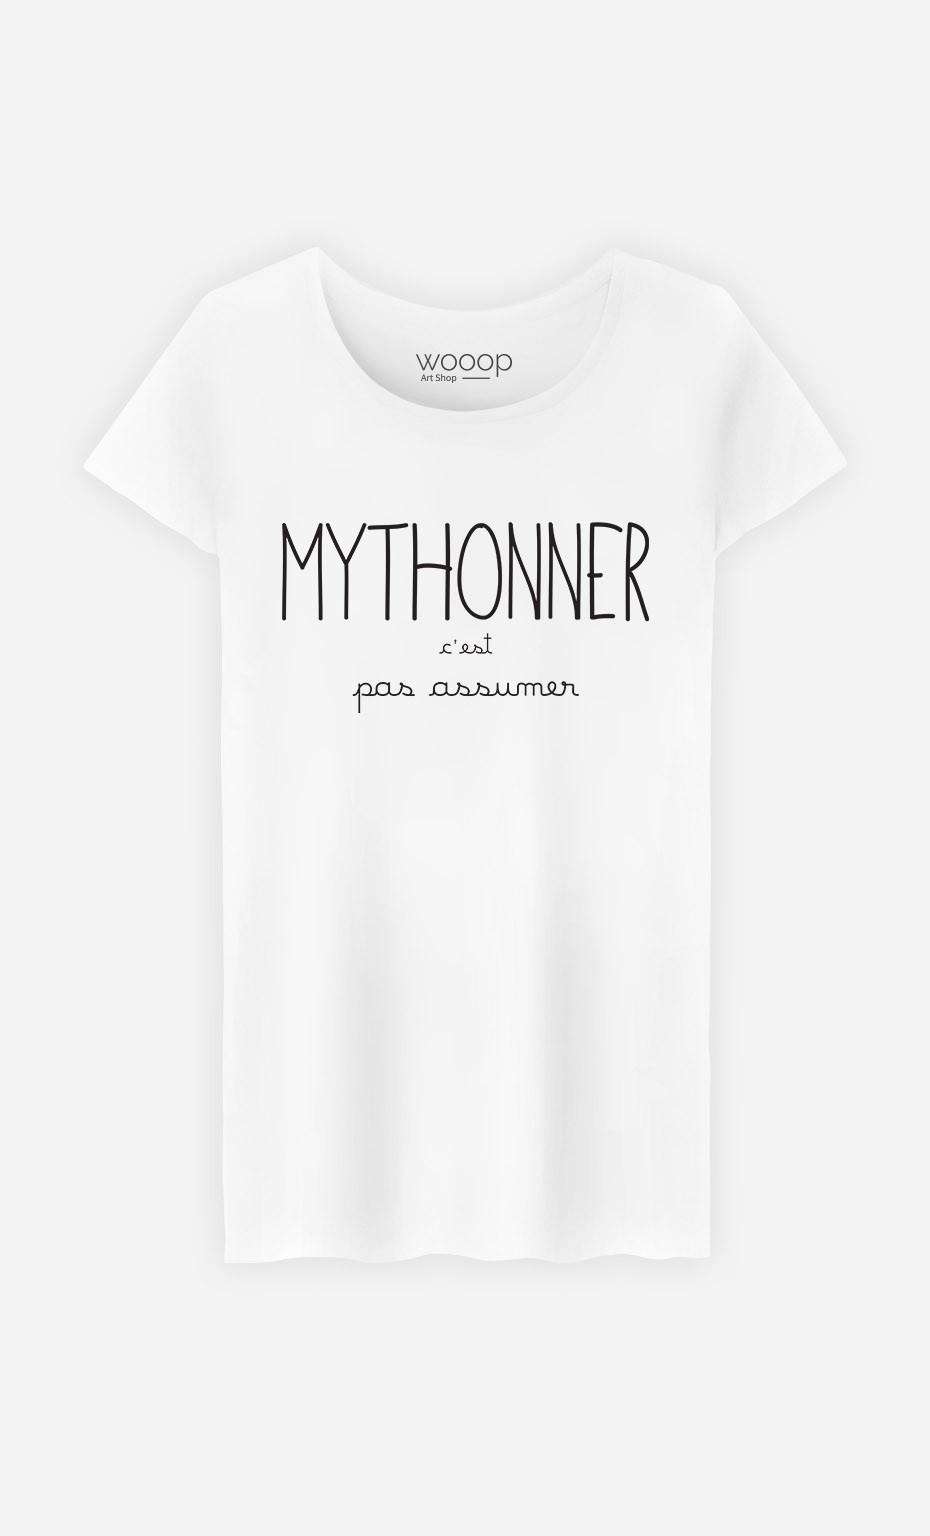 T-Shirt Mythoner c'est pas Assumer